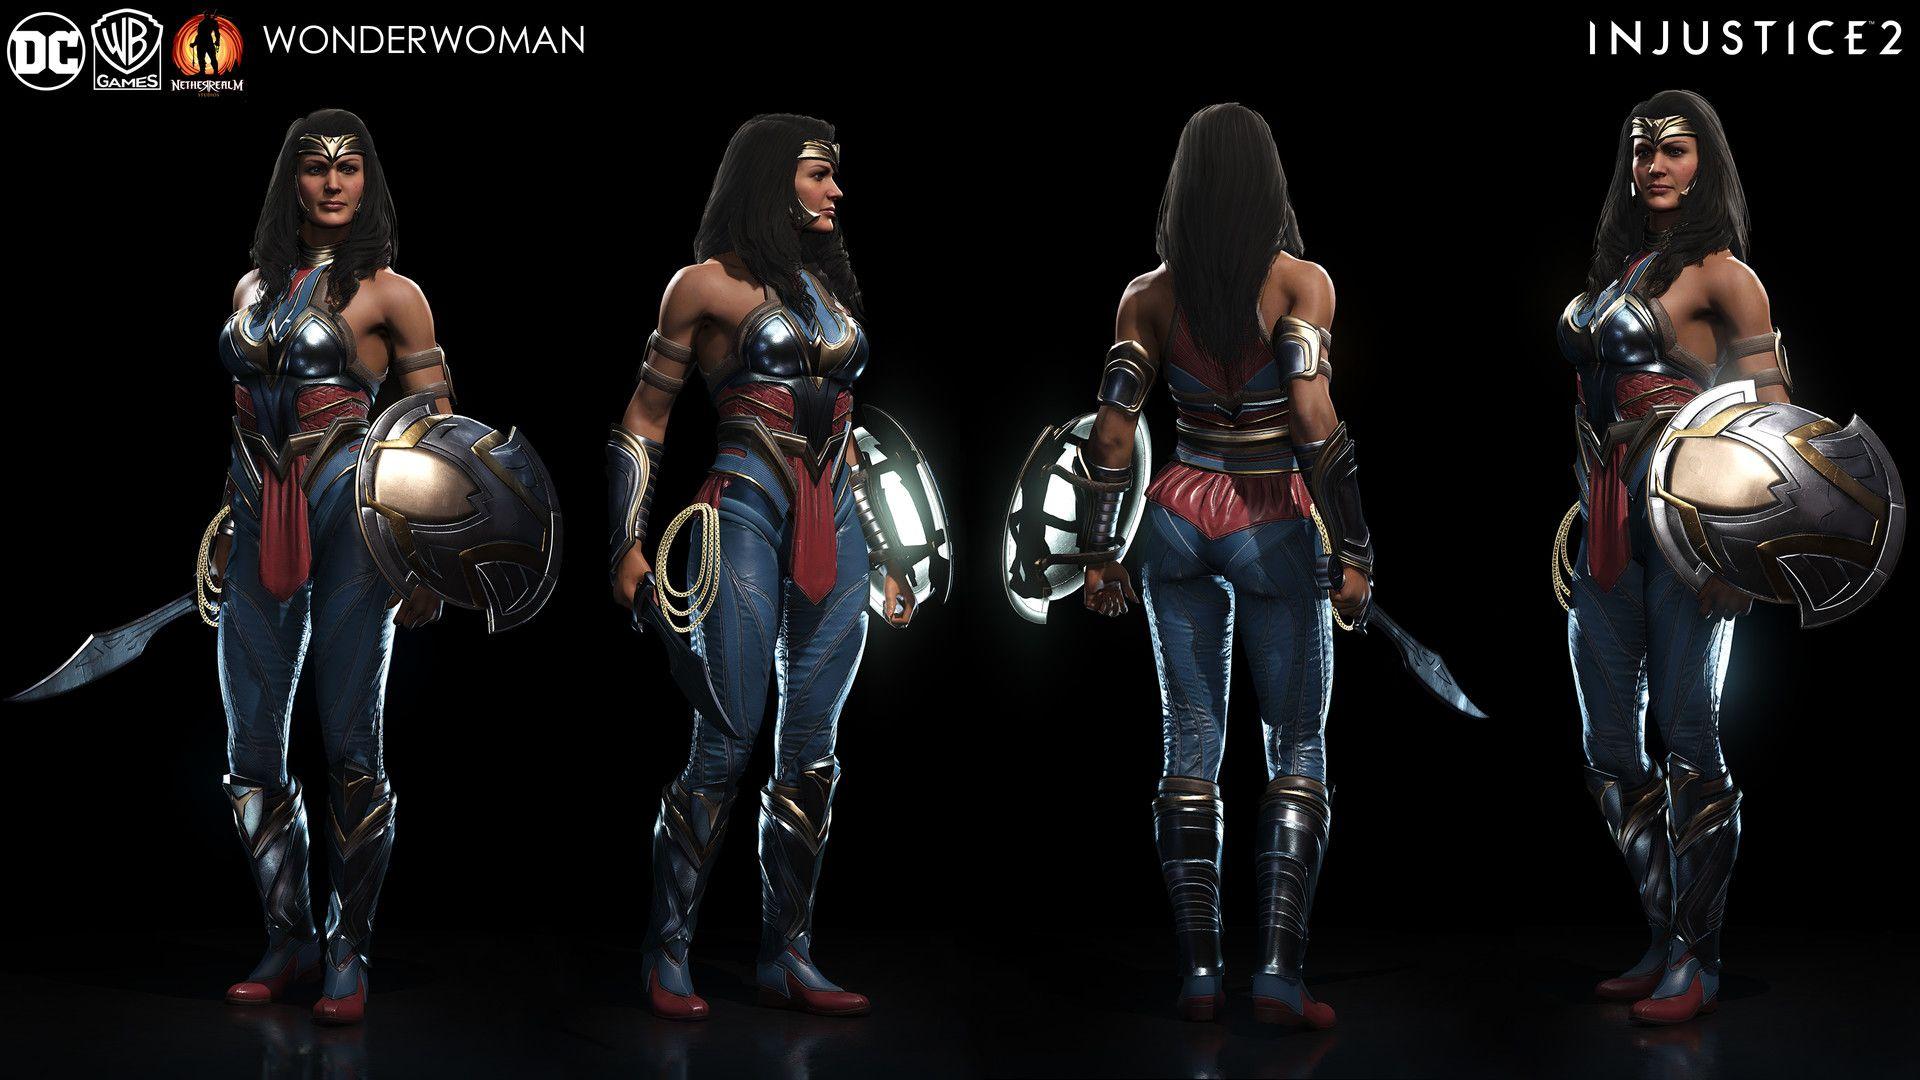 ArtStation - Injustice 2 - Wonder Woman, Solomon Gaitan ...